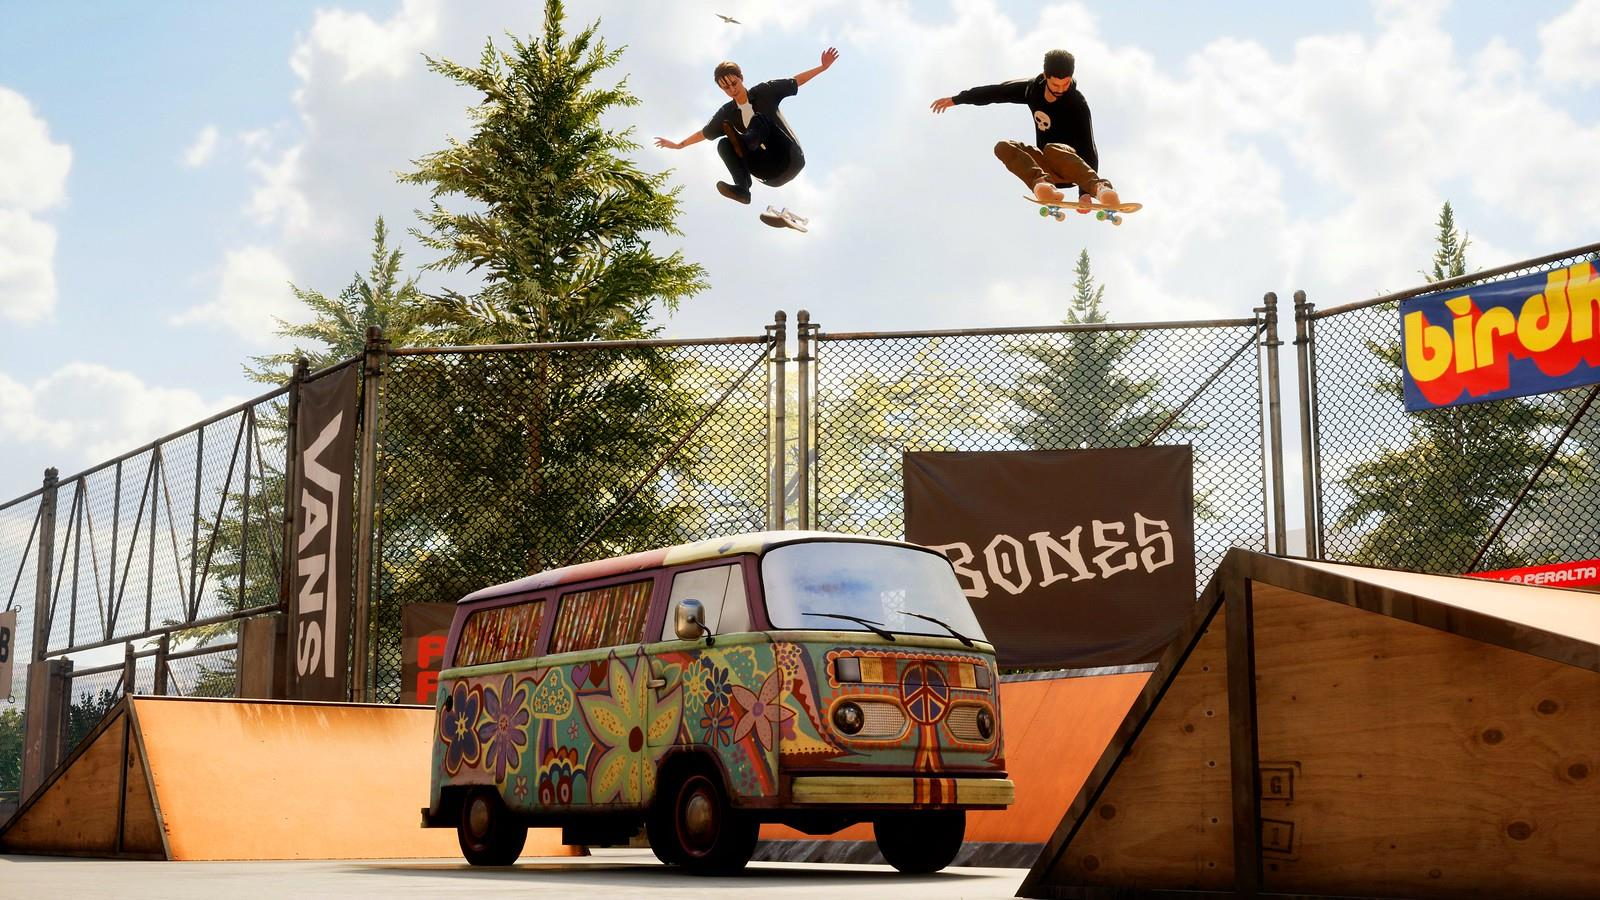 Tony Hawk's Pro Skater 1 + 2 (Next Gen Update)